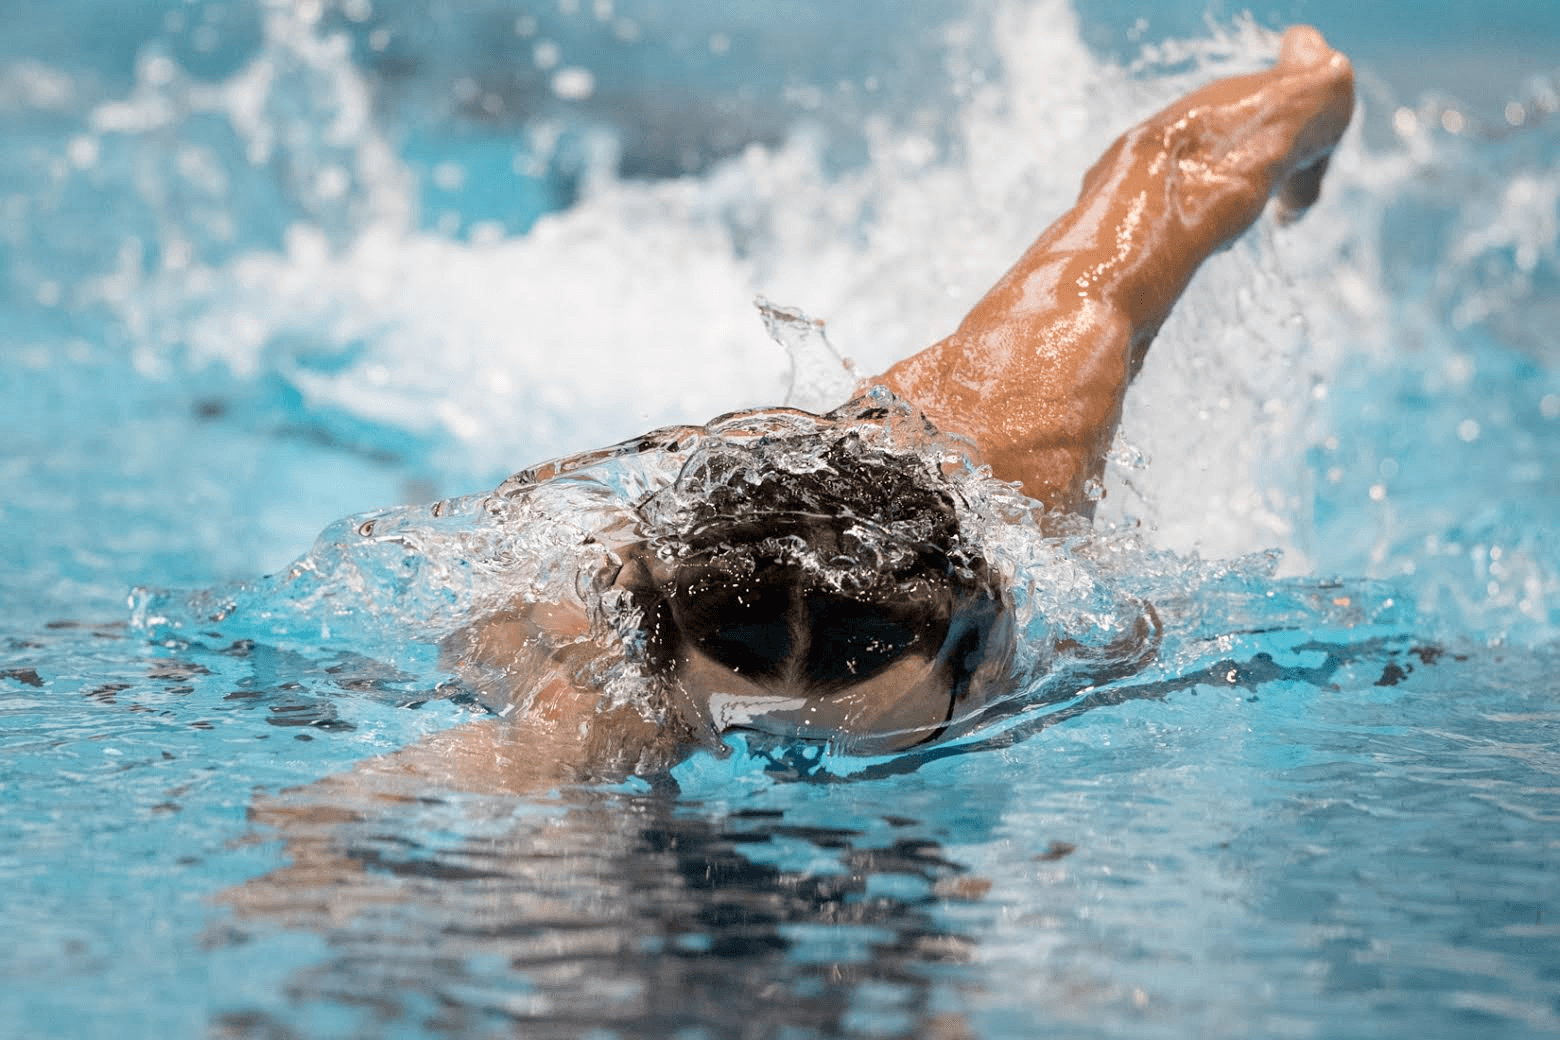 Swimmer clipart fast swimmer. Eat right swim faster